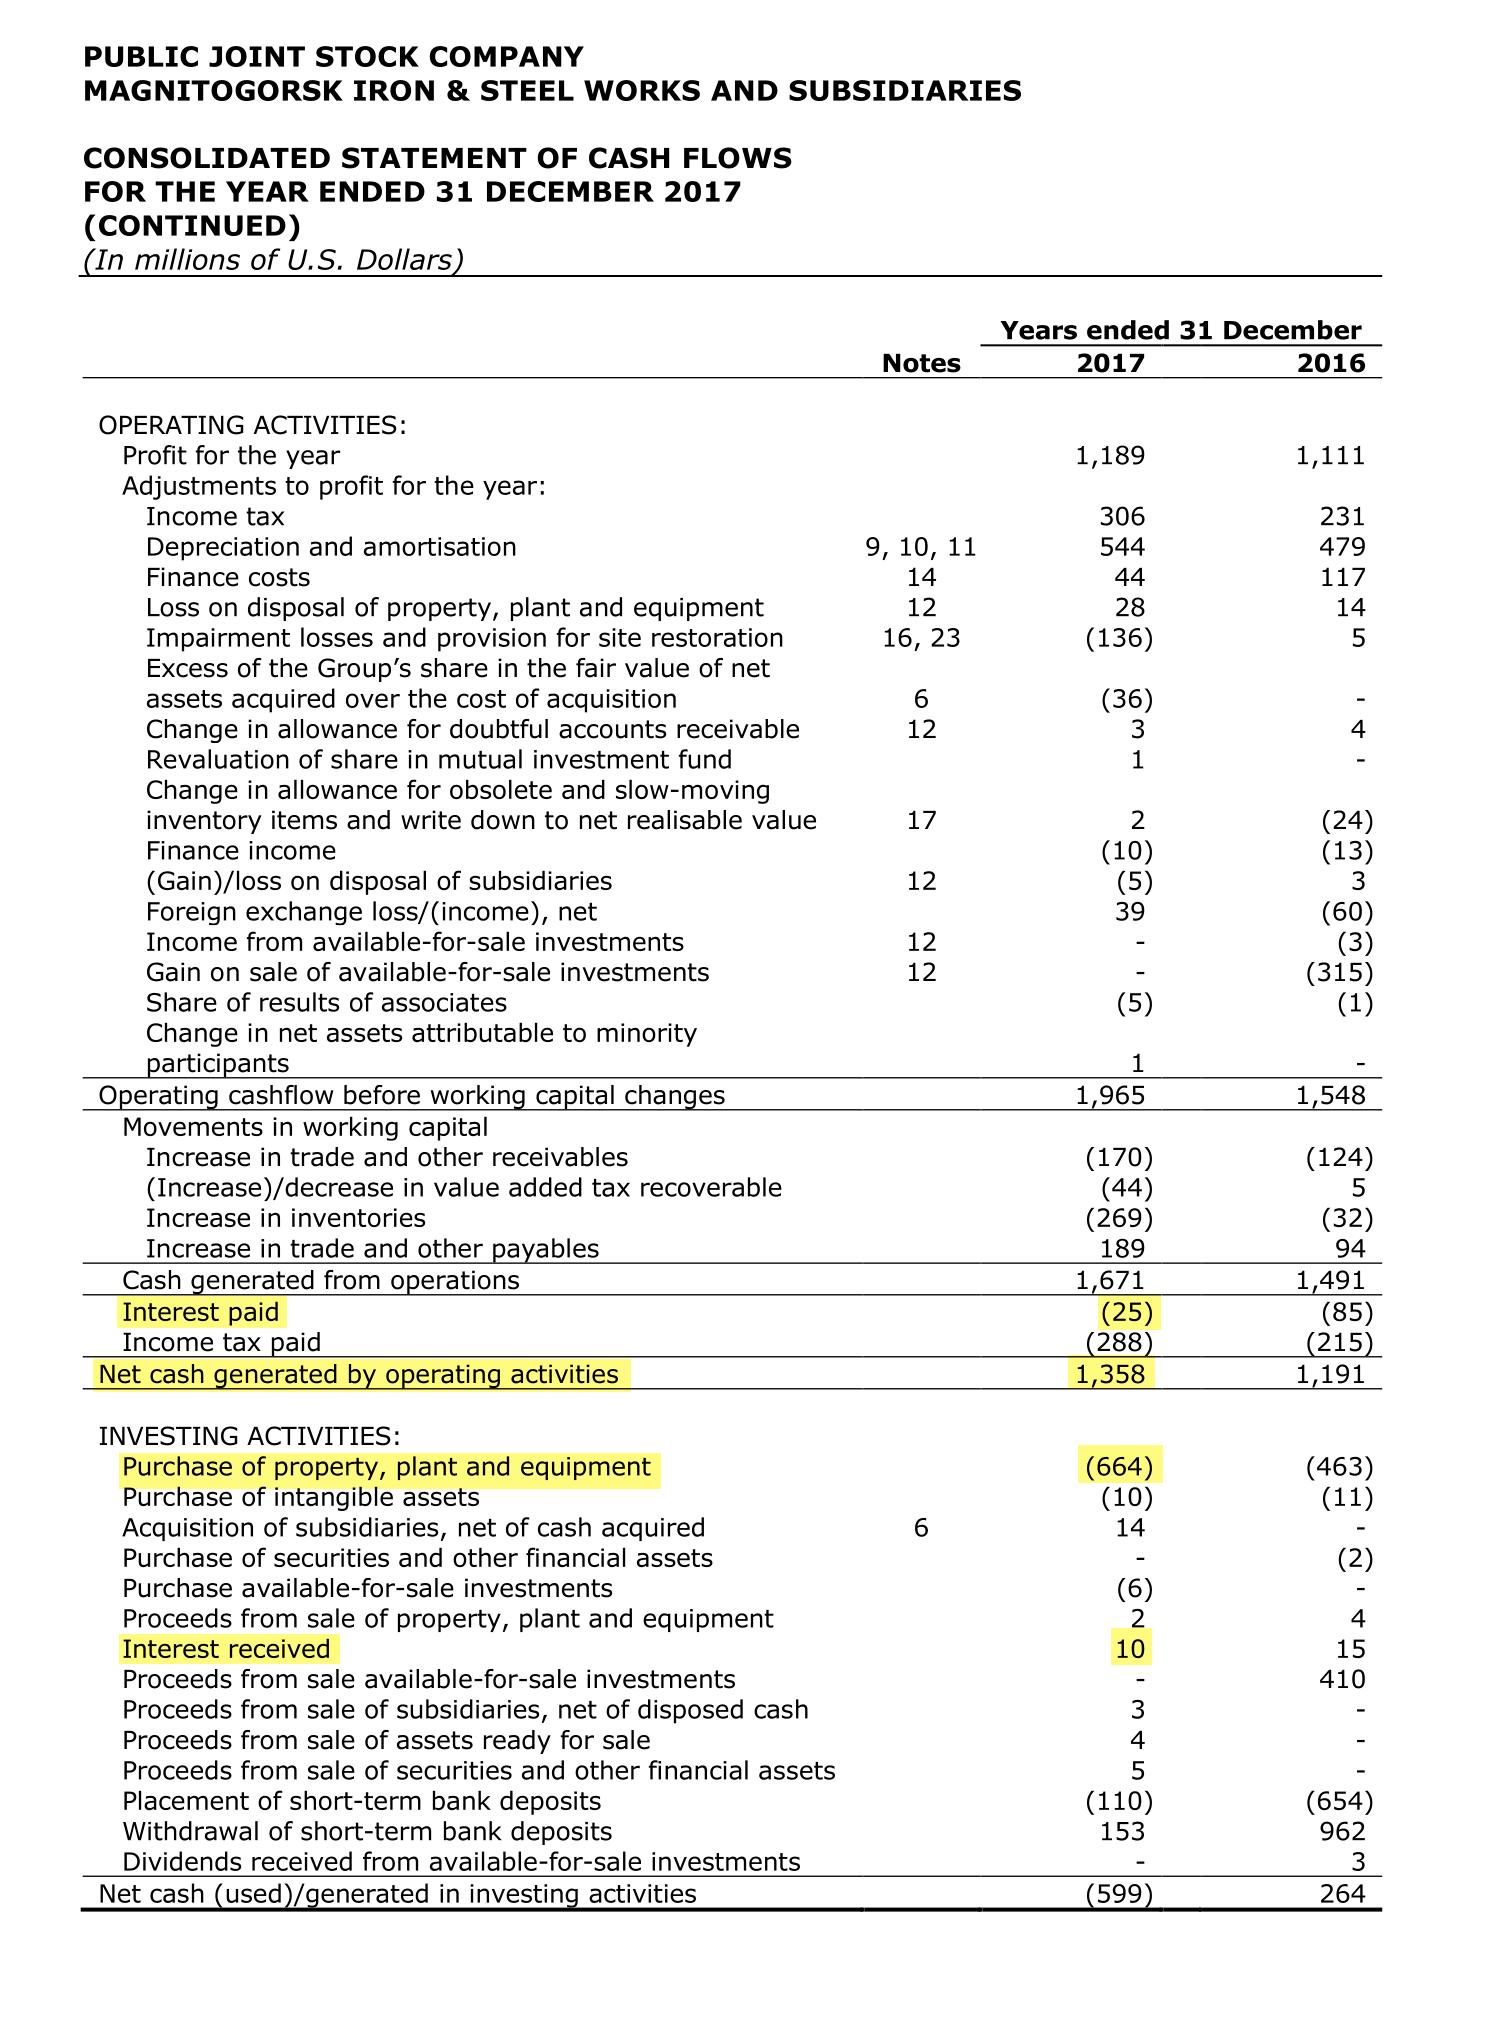 Страница 12 отчета ММК по итогам 2017 года